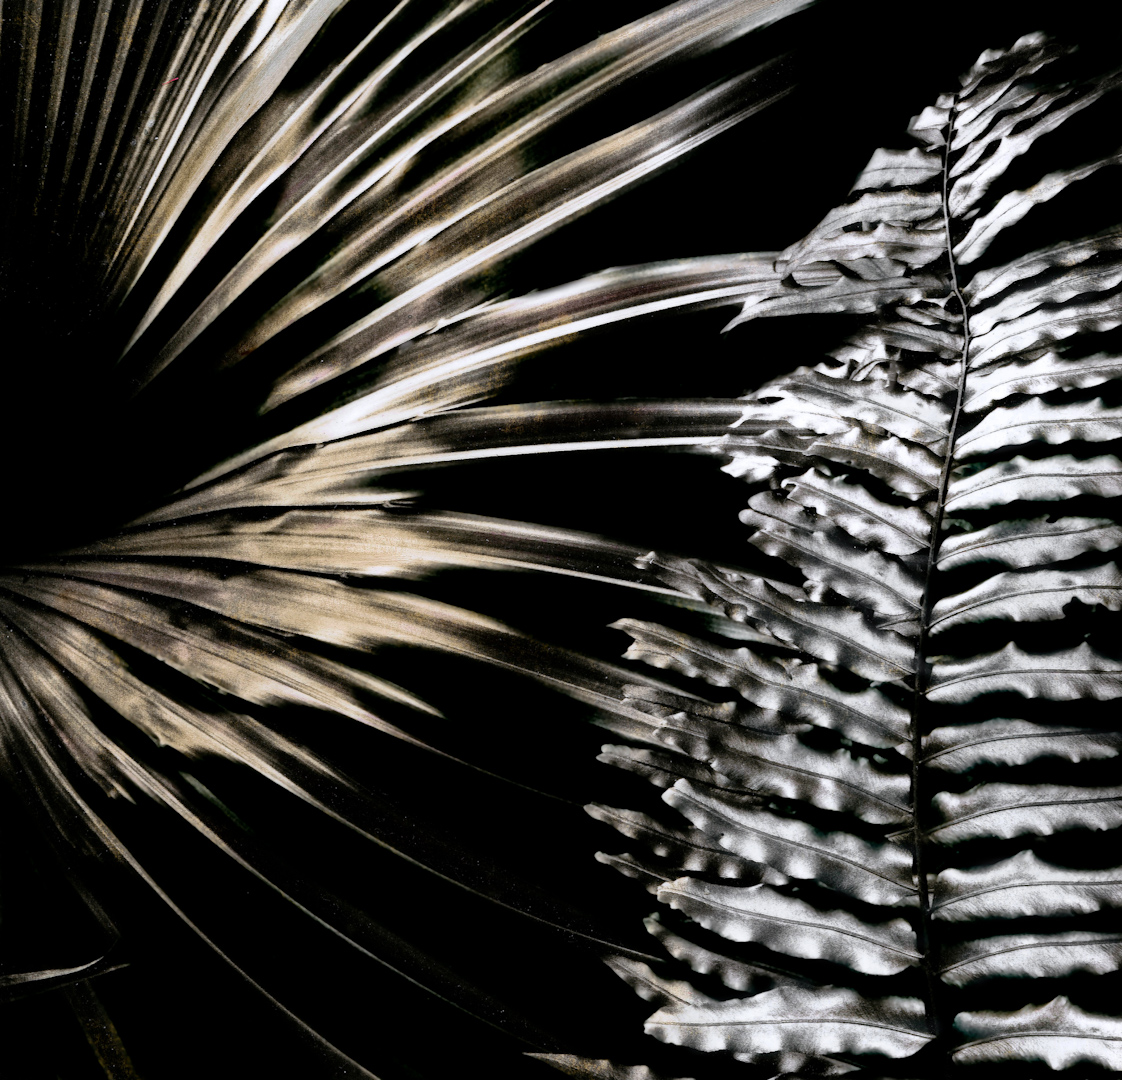 049_chinese palm fan.jpg